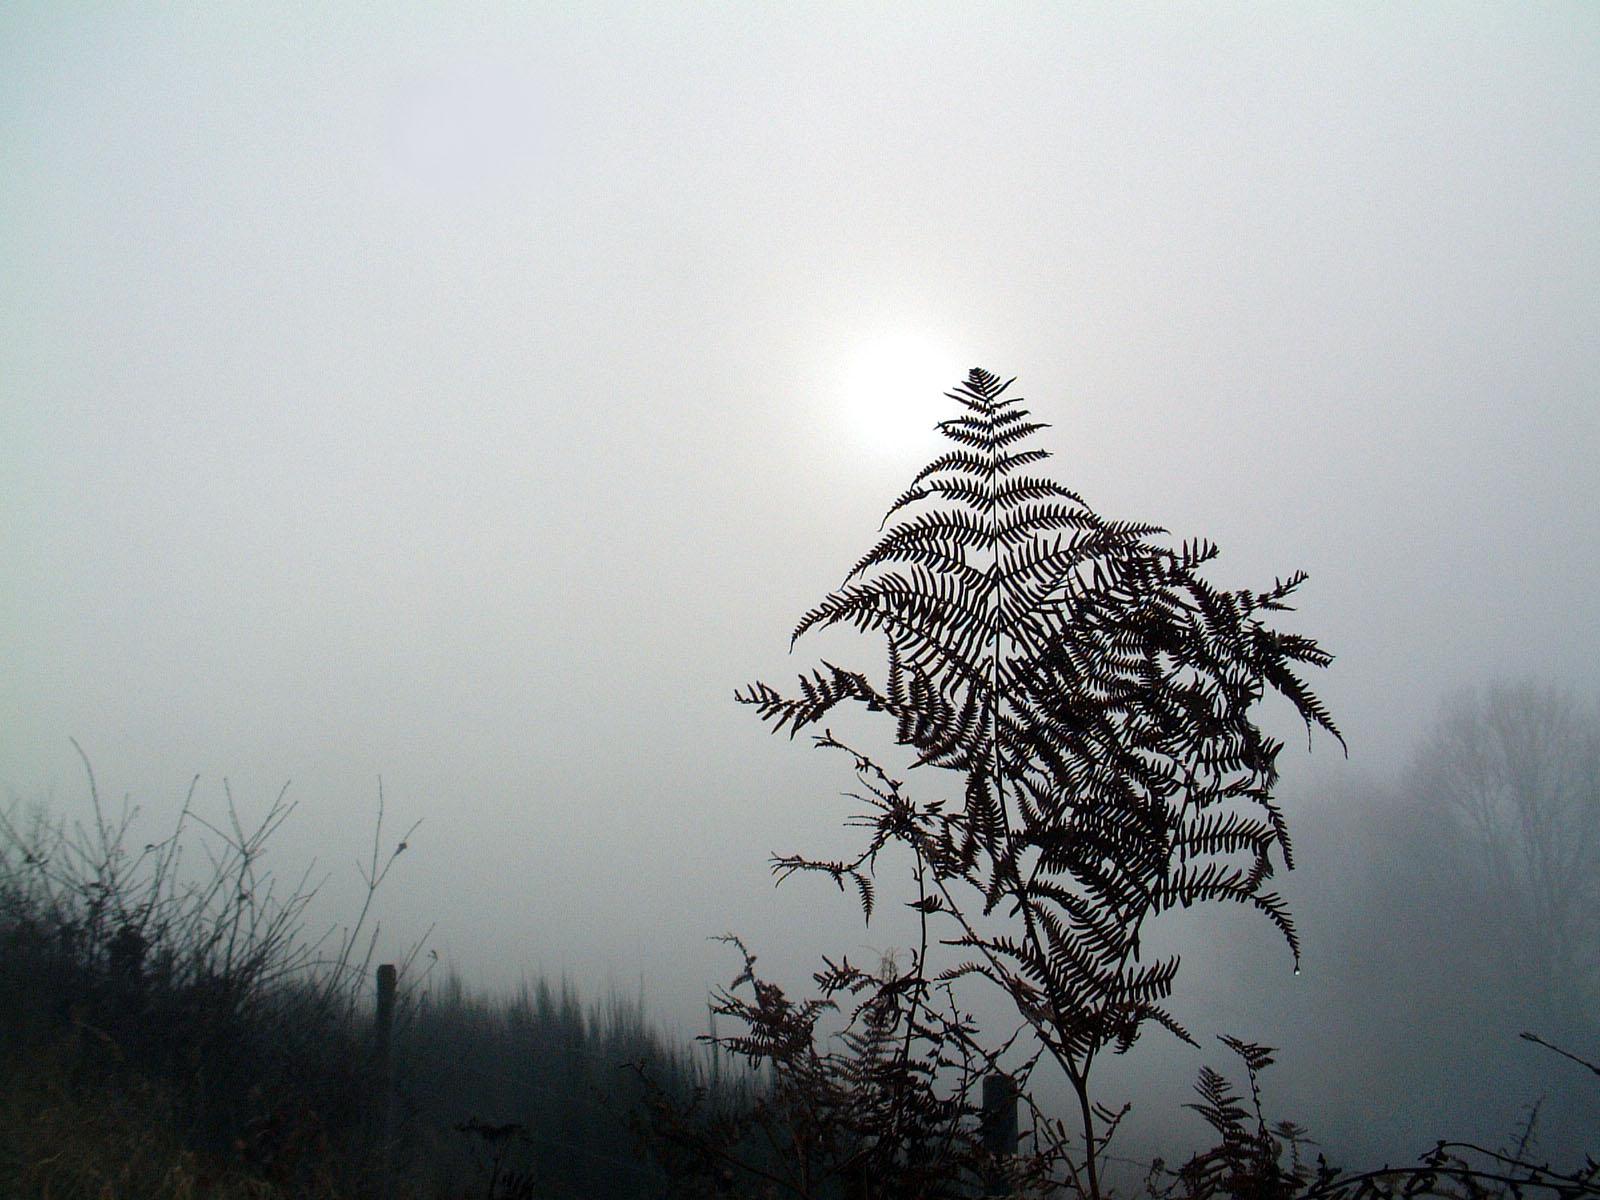 Farn im Nebel